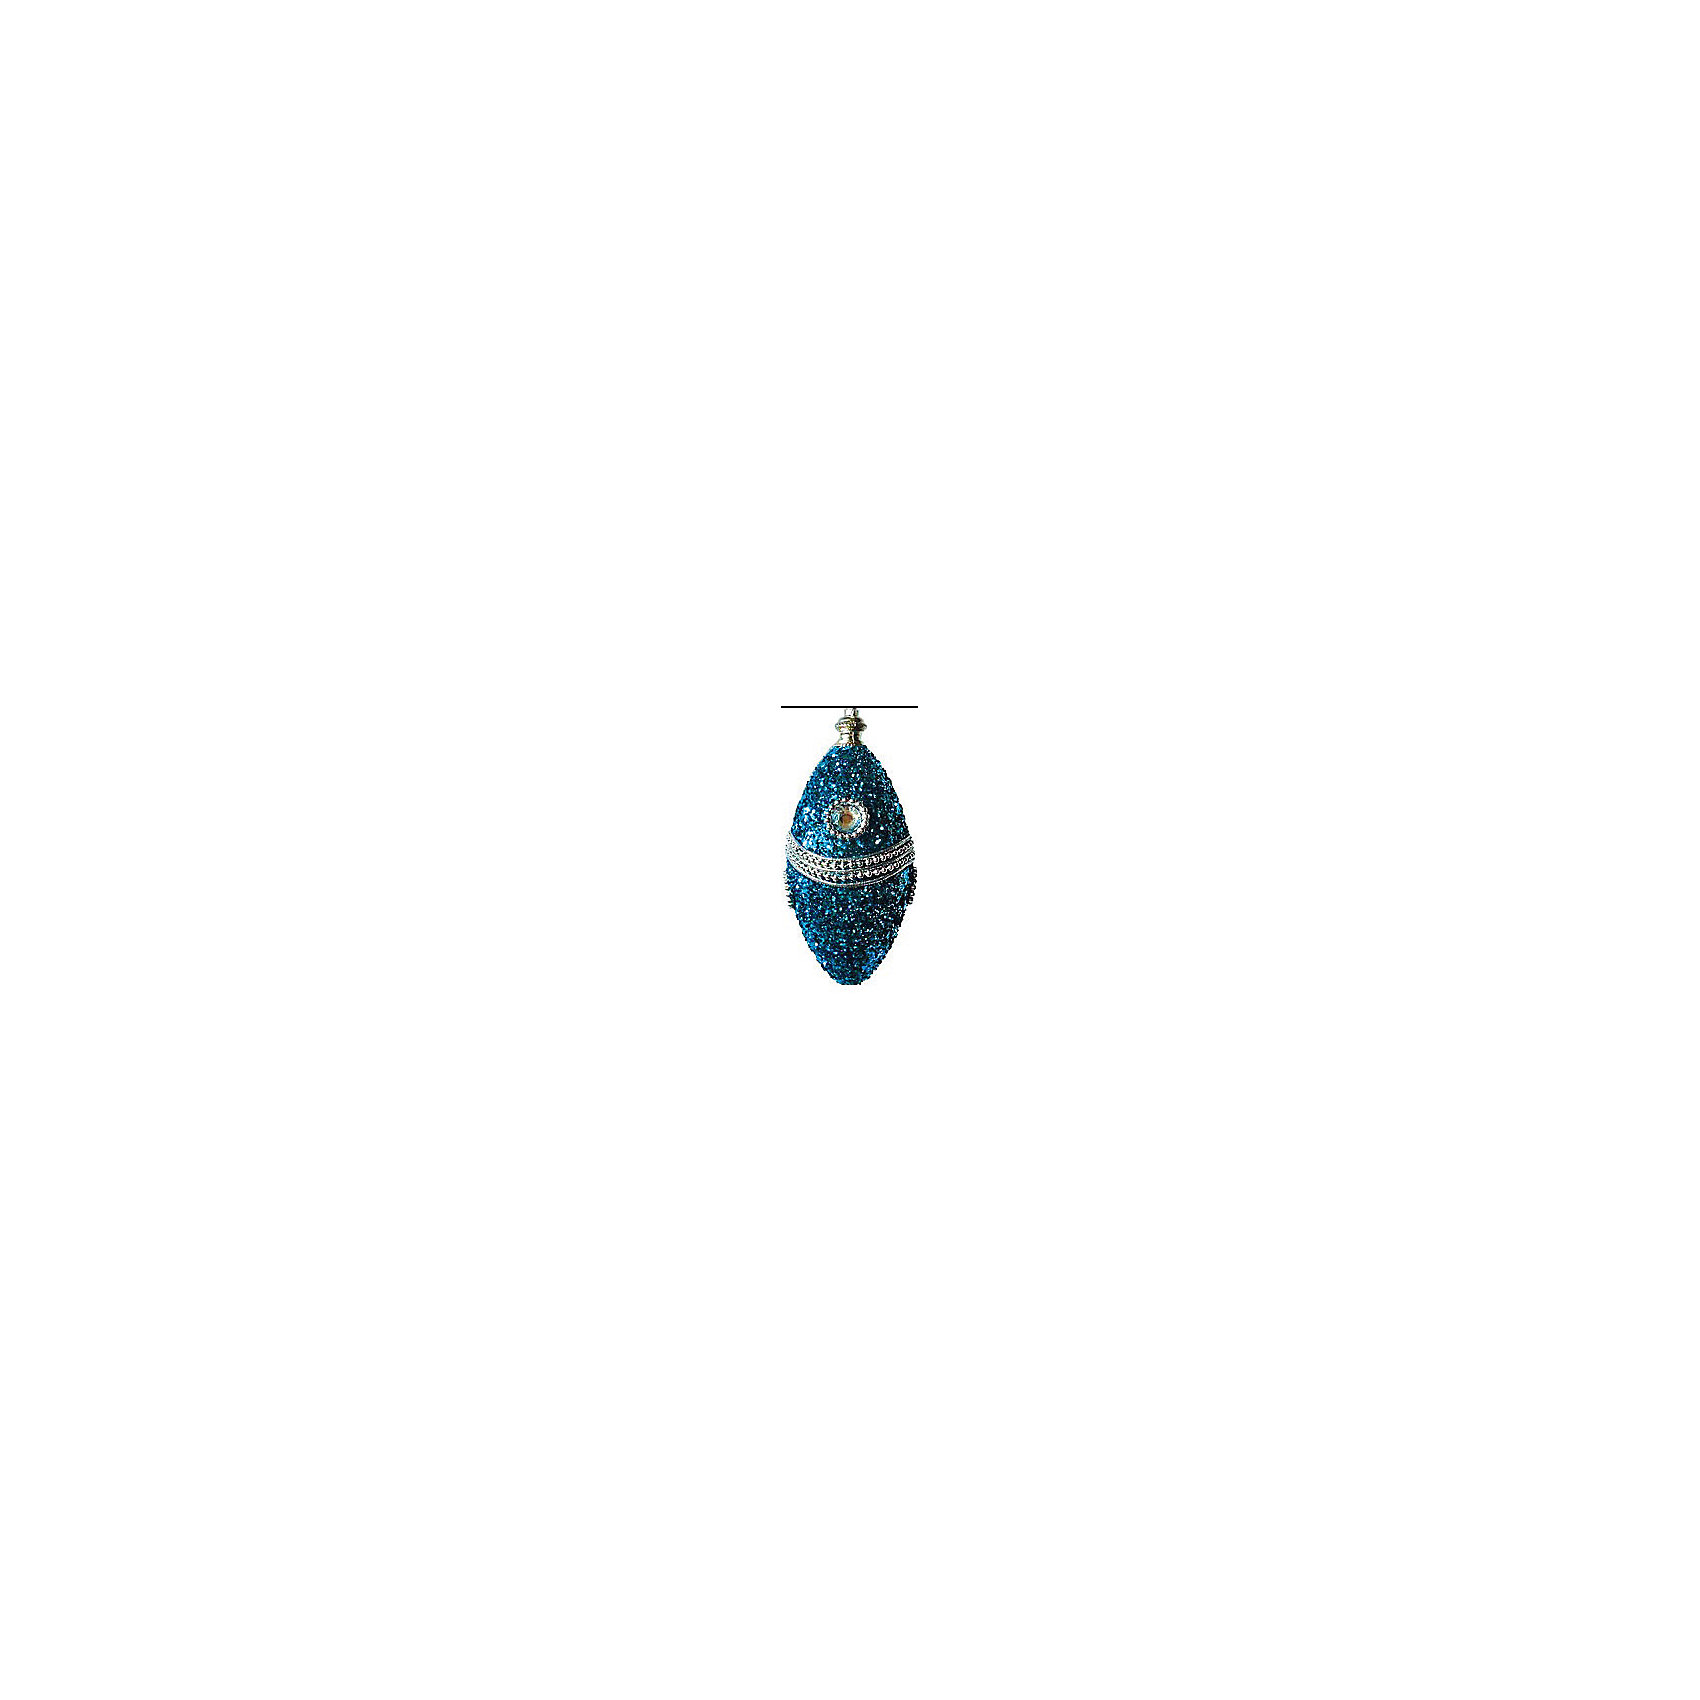 Marko Ferenzo Набор Сосулька 13 см, 3 шт, синий/серебро marko ferenzo набор шаров русский 8 см 4 шт золото